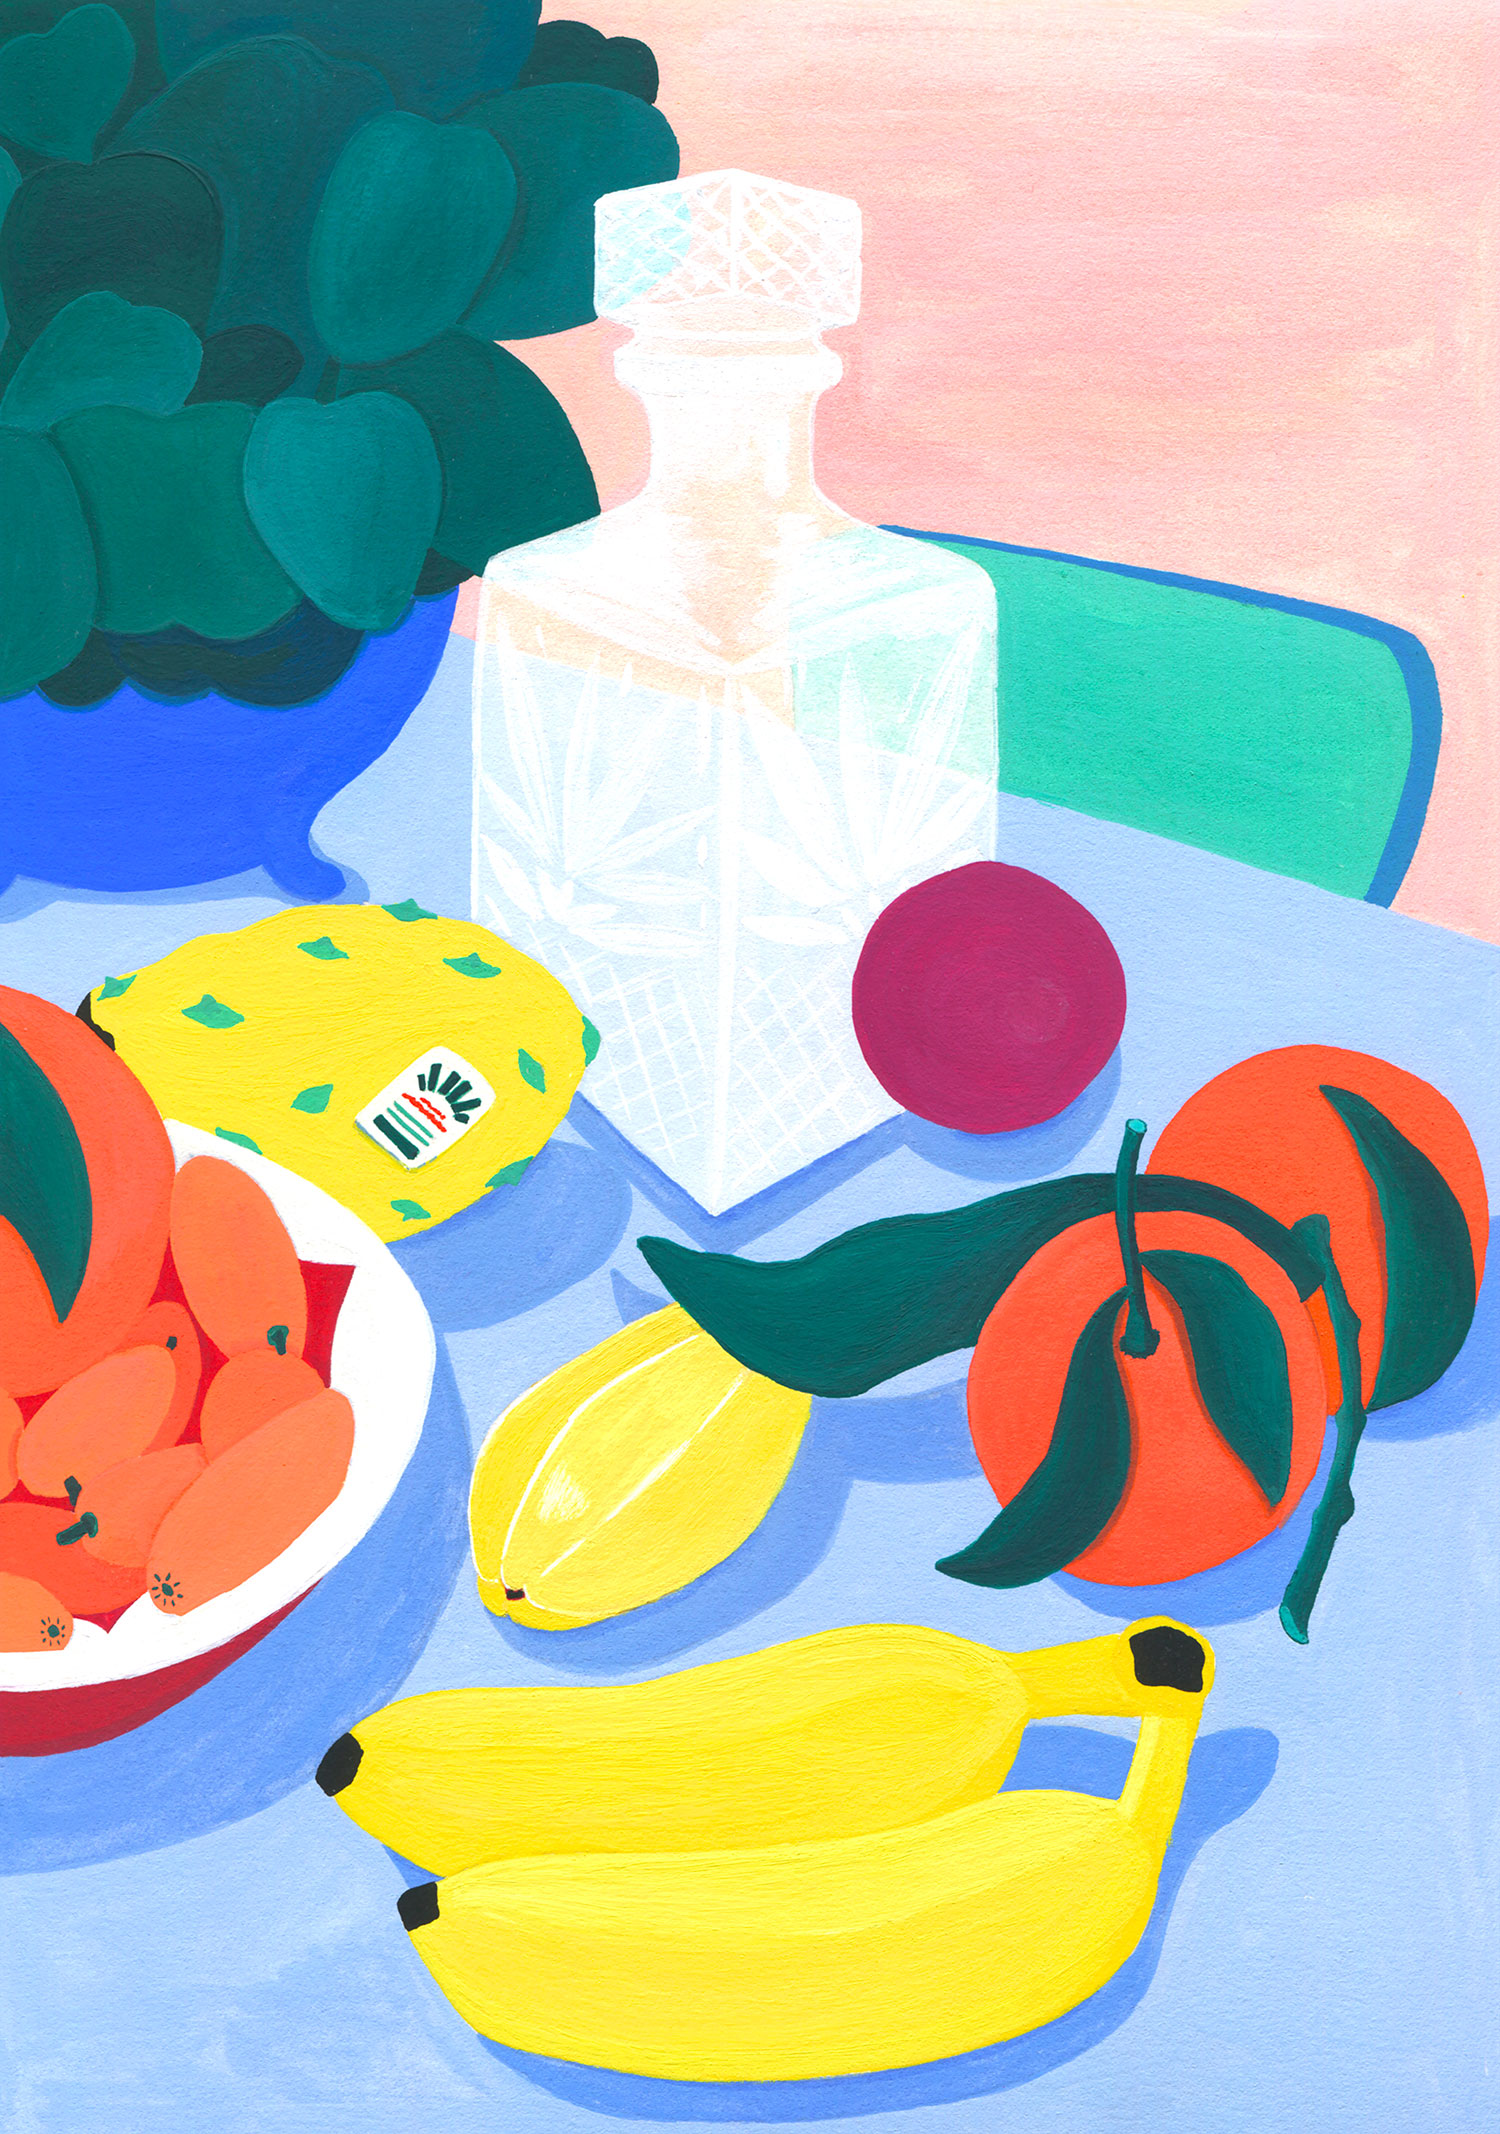 illustration-mariepellet-illustratrice-gouache-projet-personnel-still-life-fruits-plante-carafe-bananes-clementine-kumquat-nature-morte